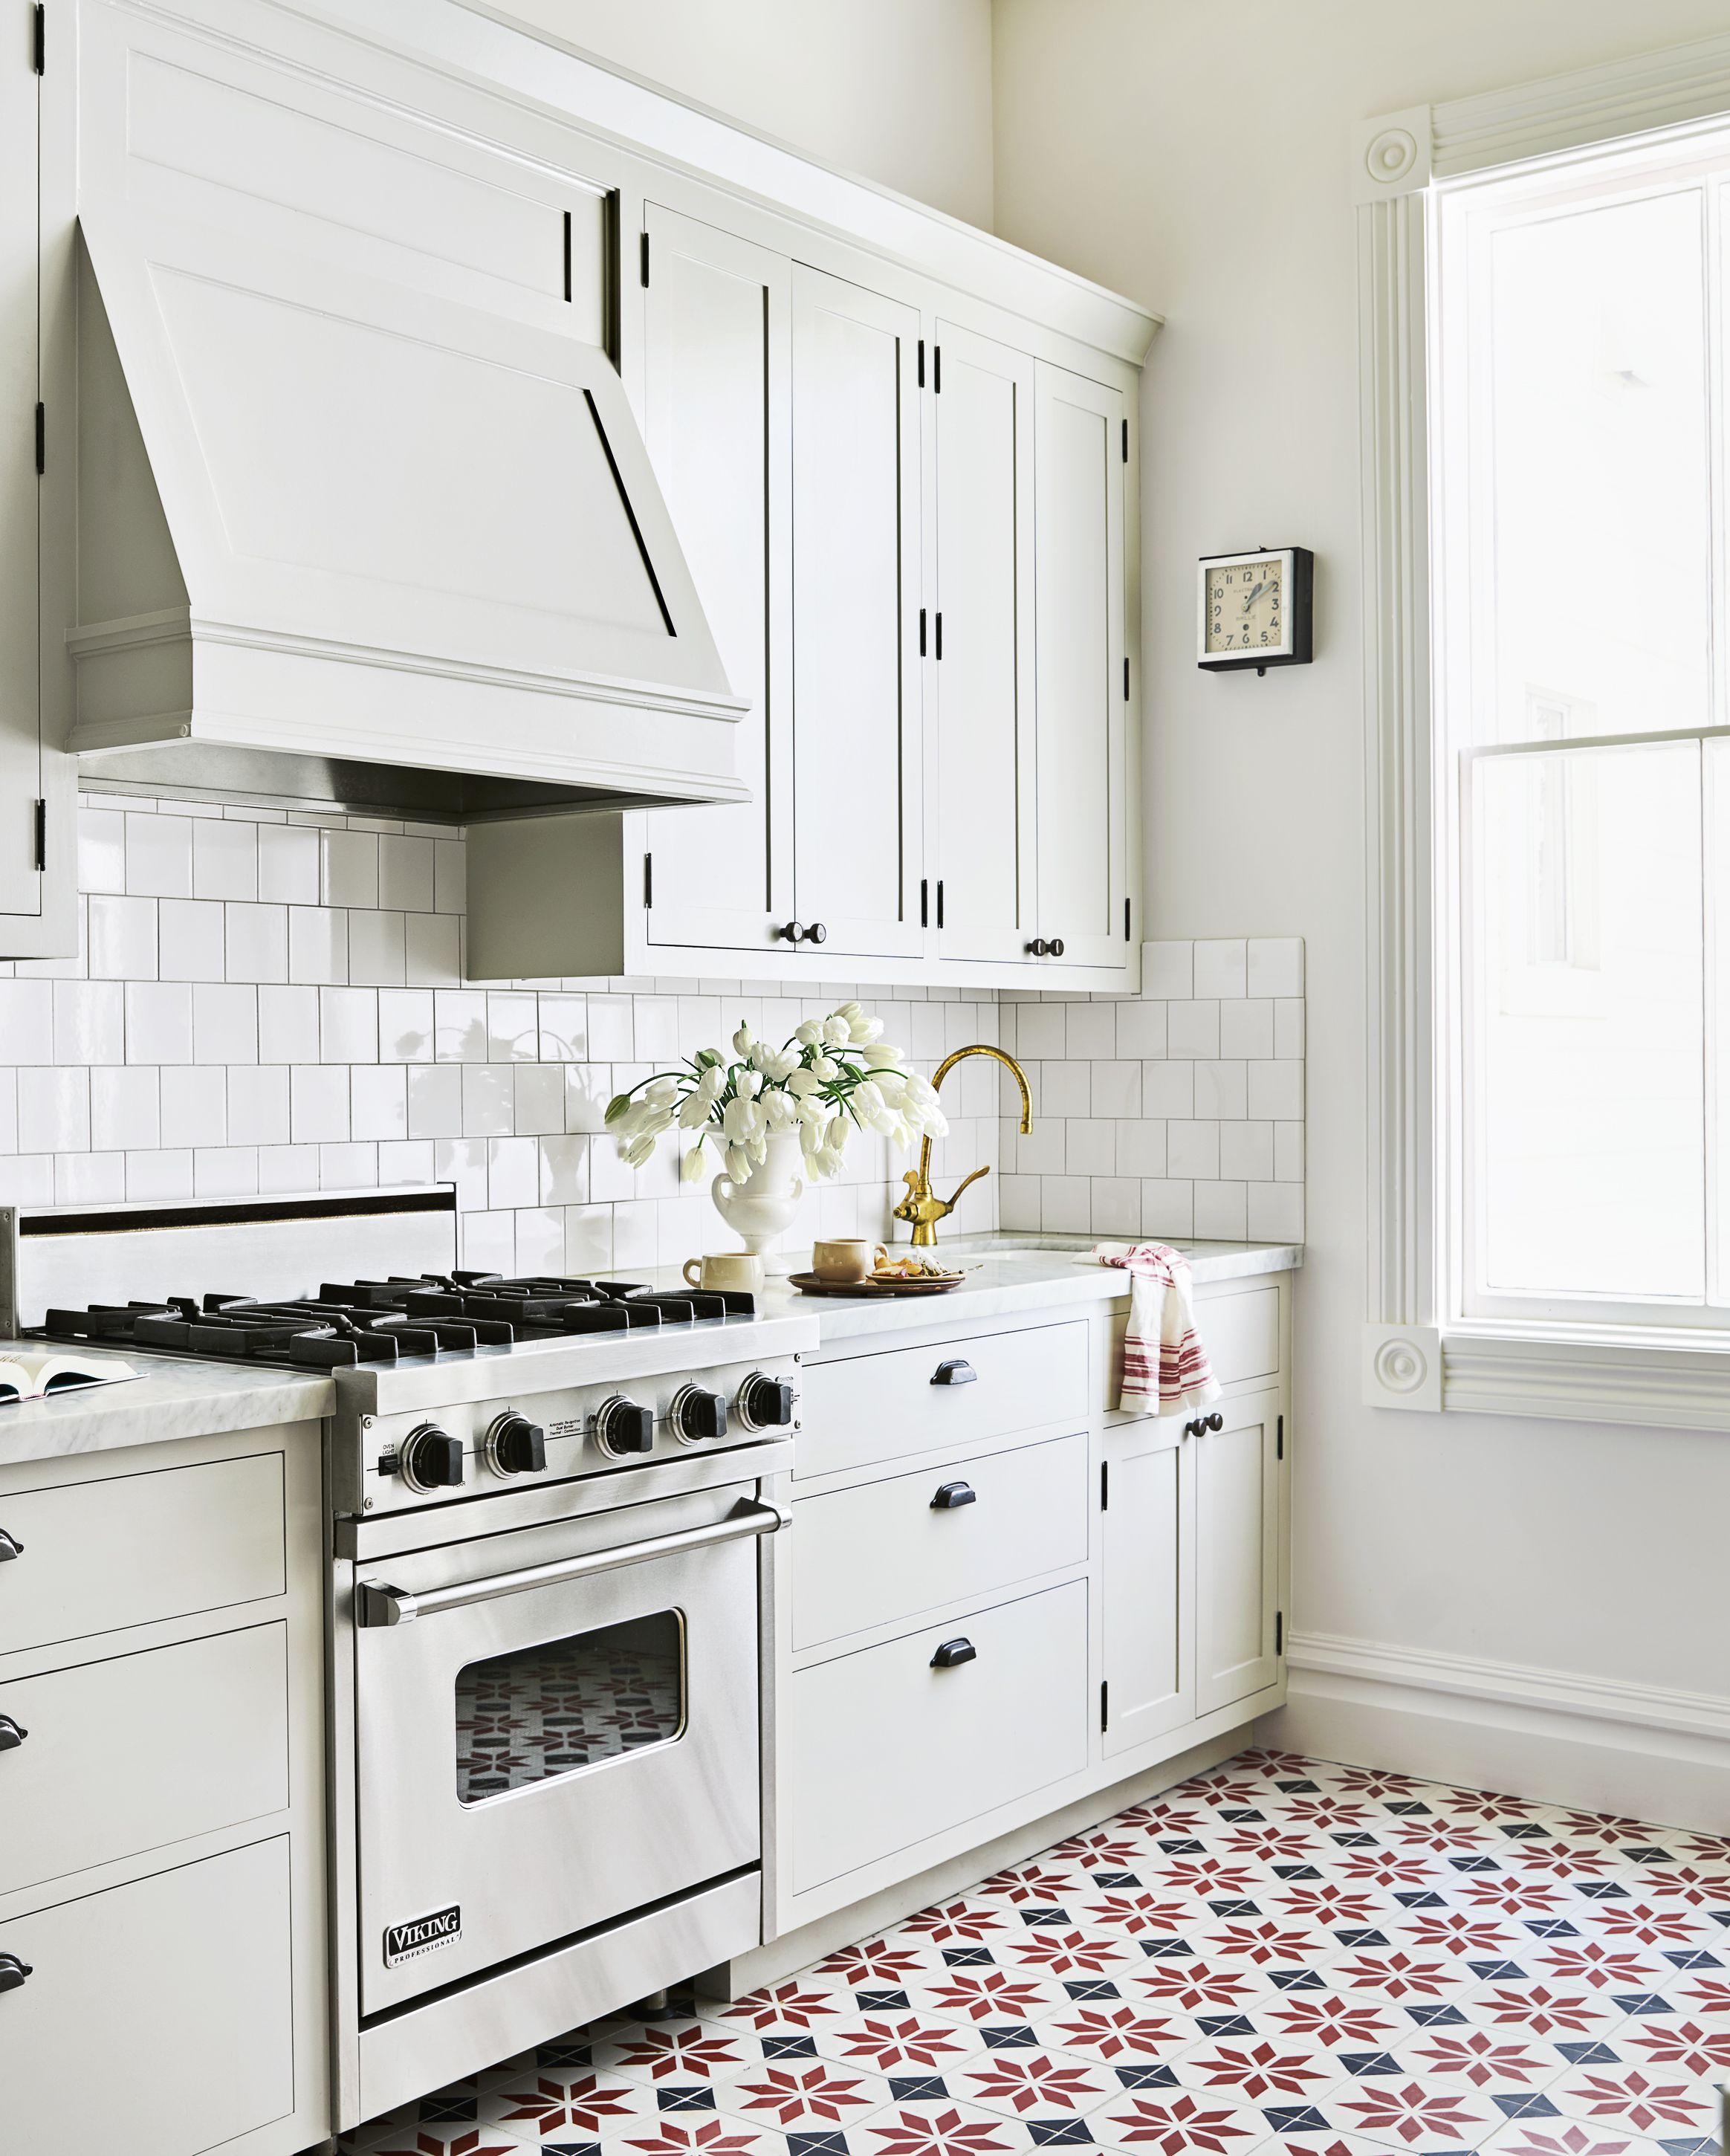 70+ Kitchen Design & Remodeling Ideas